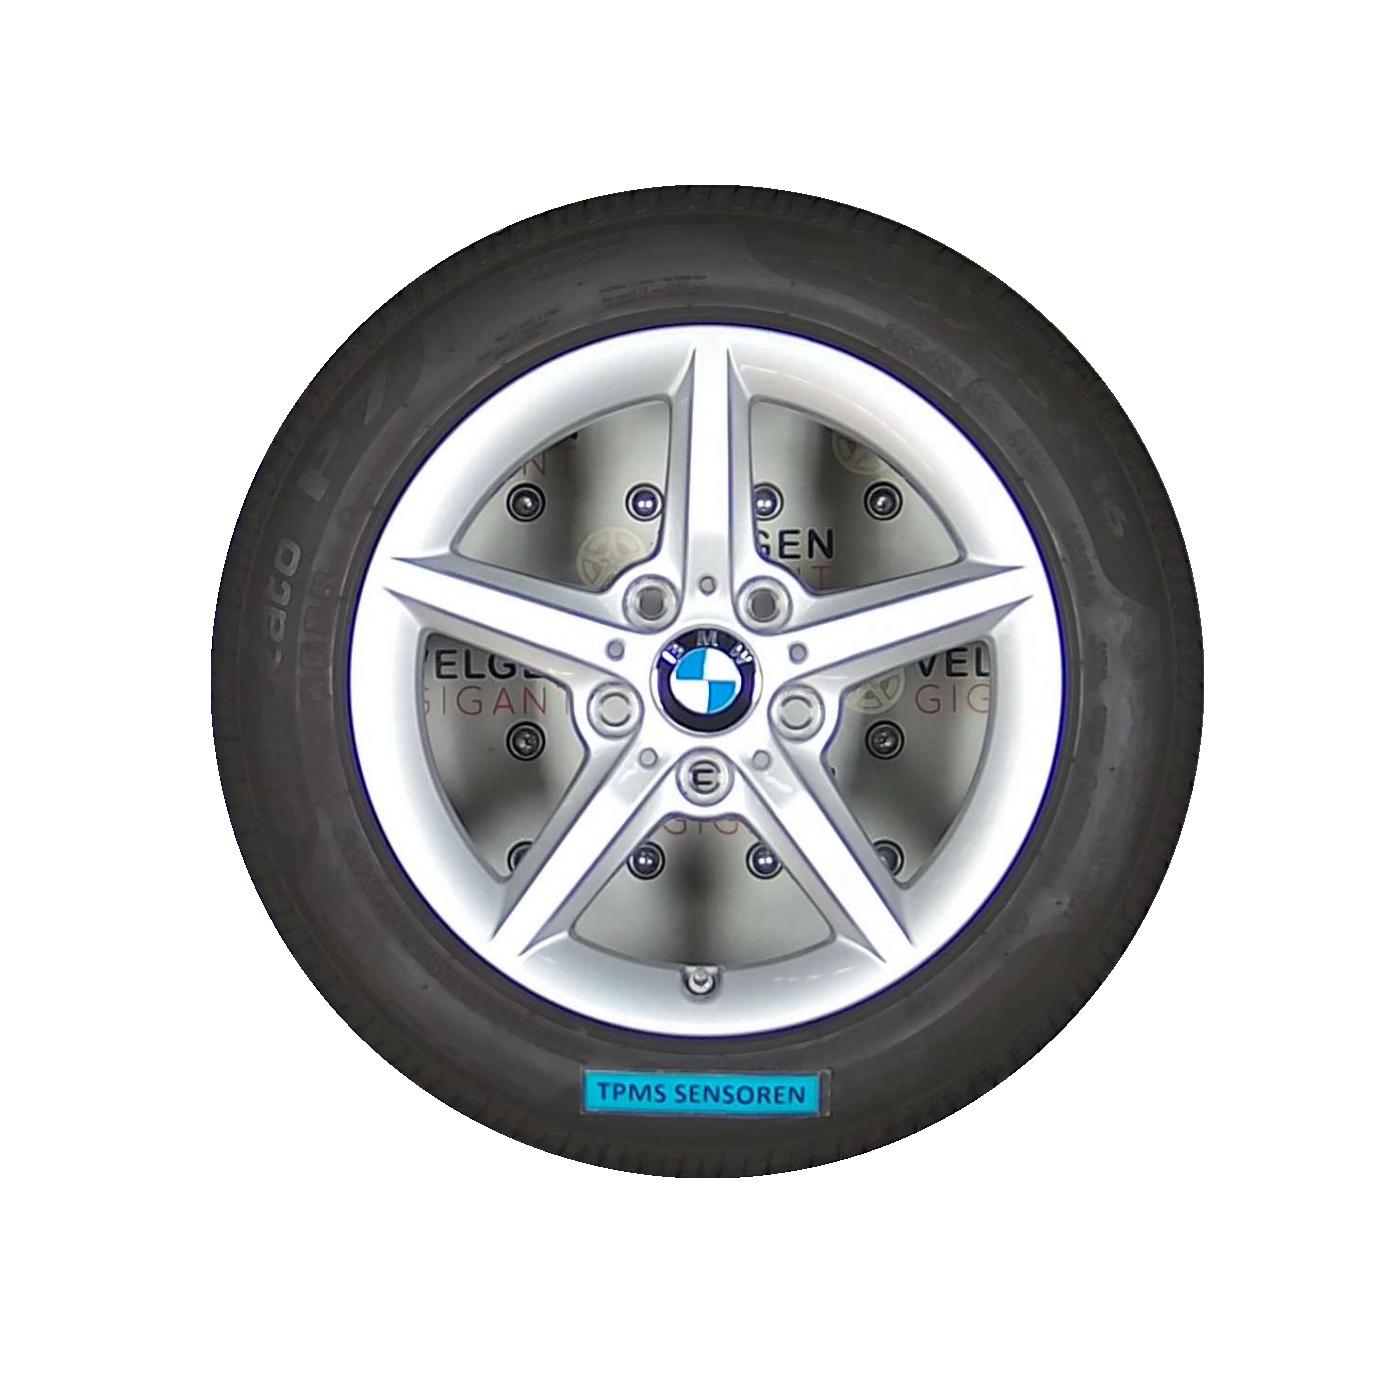 Bmw 1 Serie Styling 654 Velgen 16 Inch Met Pirelli Zomer Banden Incl Originele Tpms Sensoren